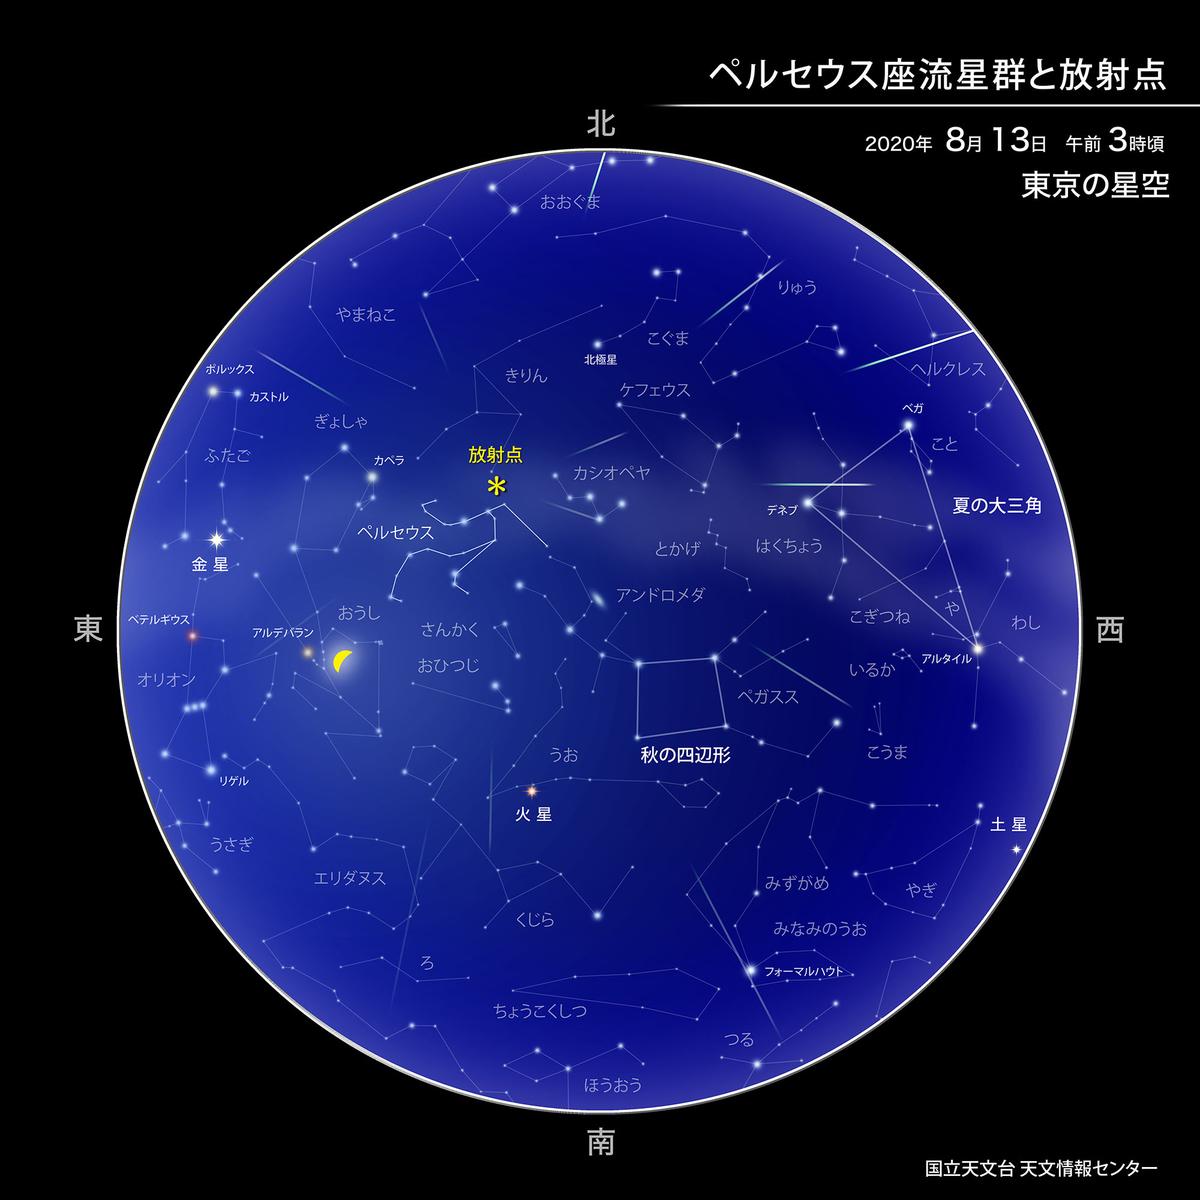 f:id:globalharmony19:20200801133301j:plain